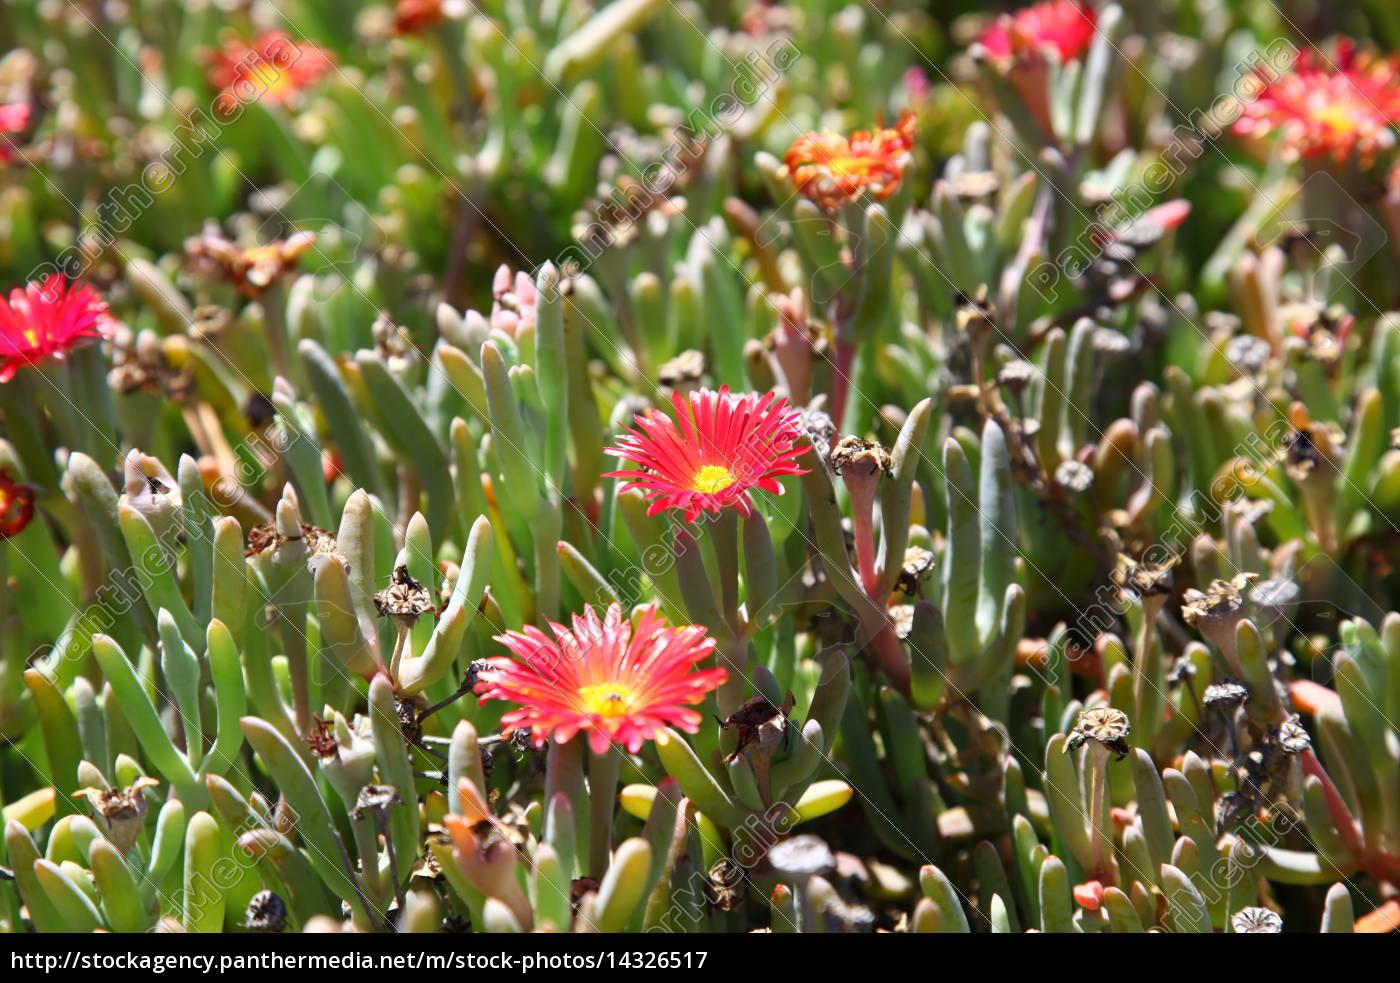 Fuerteventura, Kanarischen Inseln, Kanaren, Natur, Pflanze, Pflanzen - 14326517